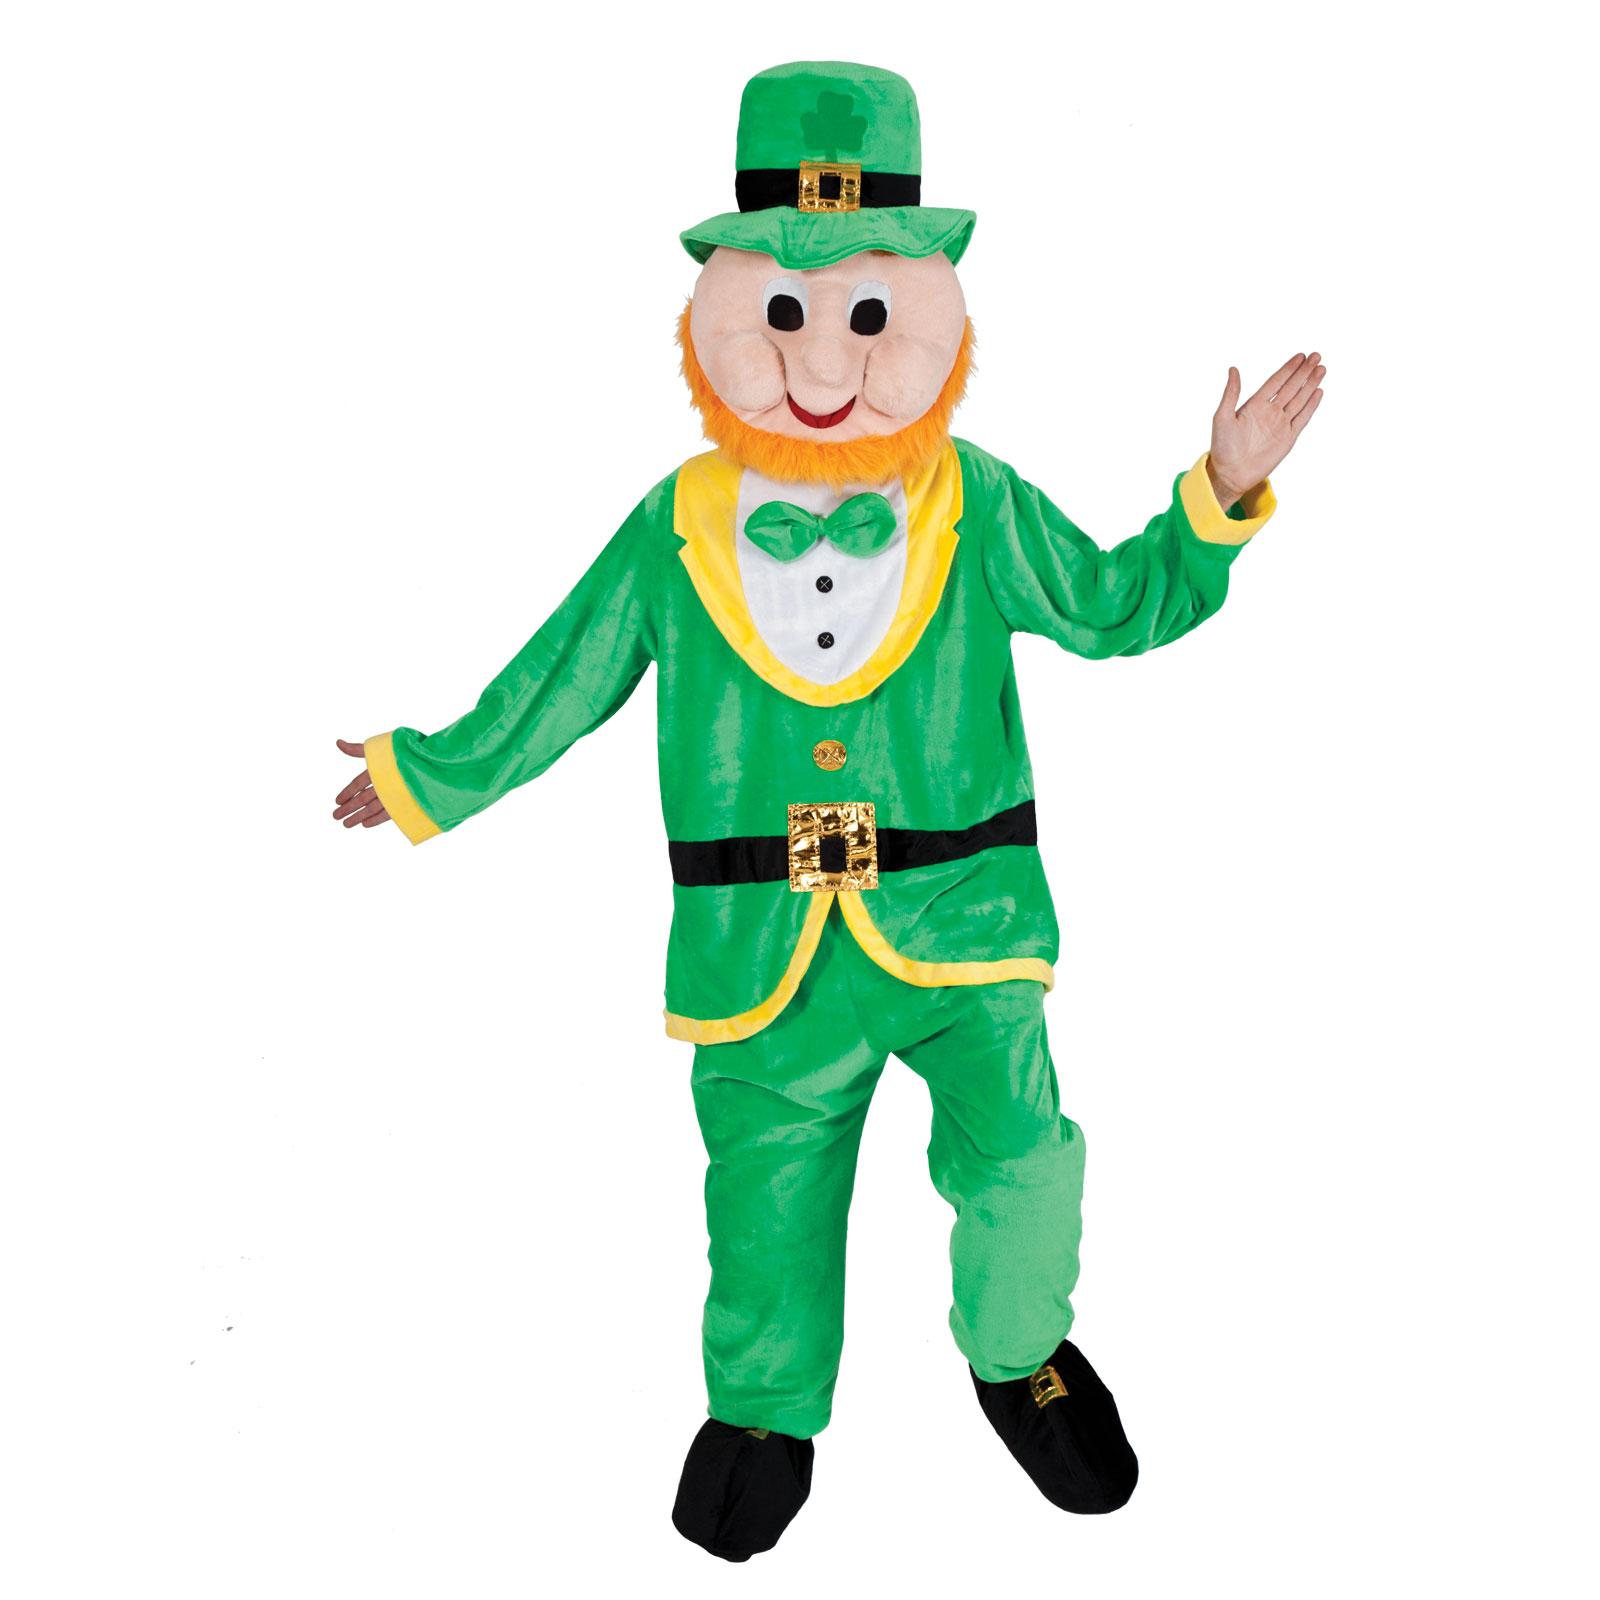 Adult-Mascot-Sports-Charity-Marathon-Fun-Run-Animal-Fancy-Dress-Party-Costume